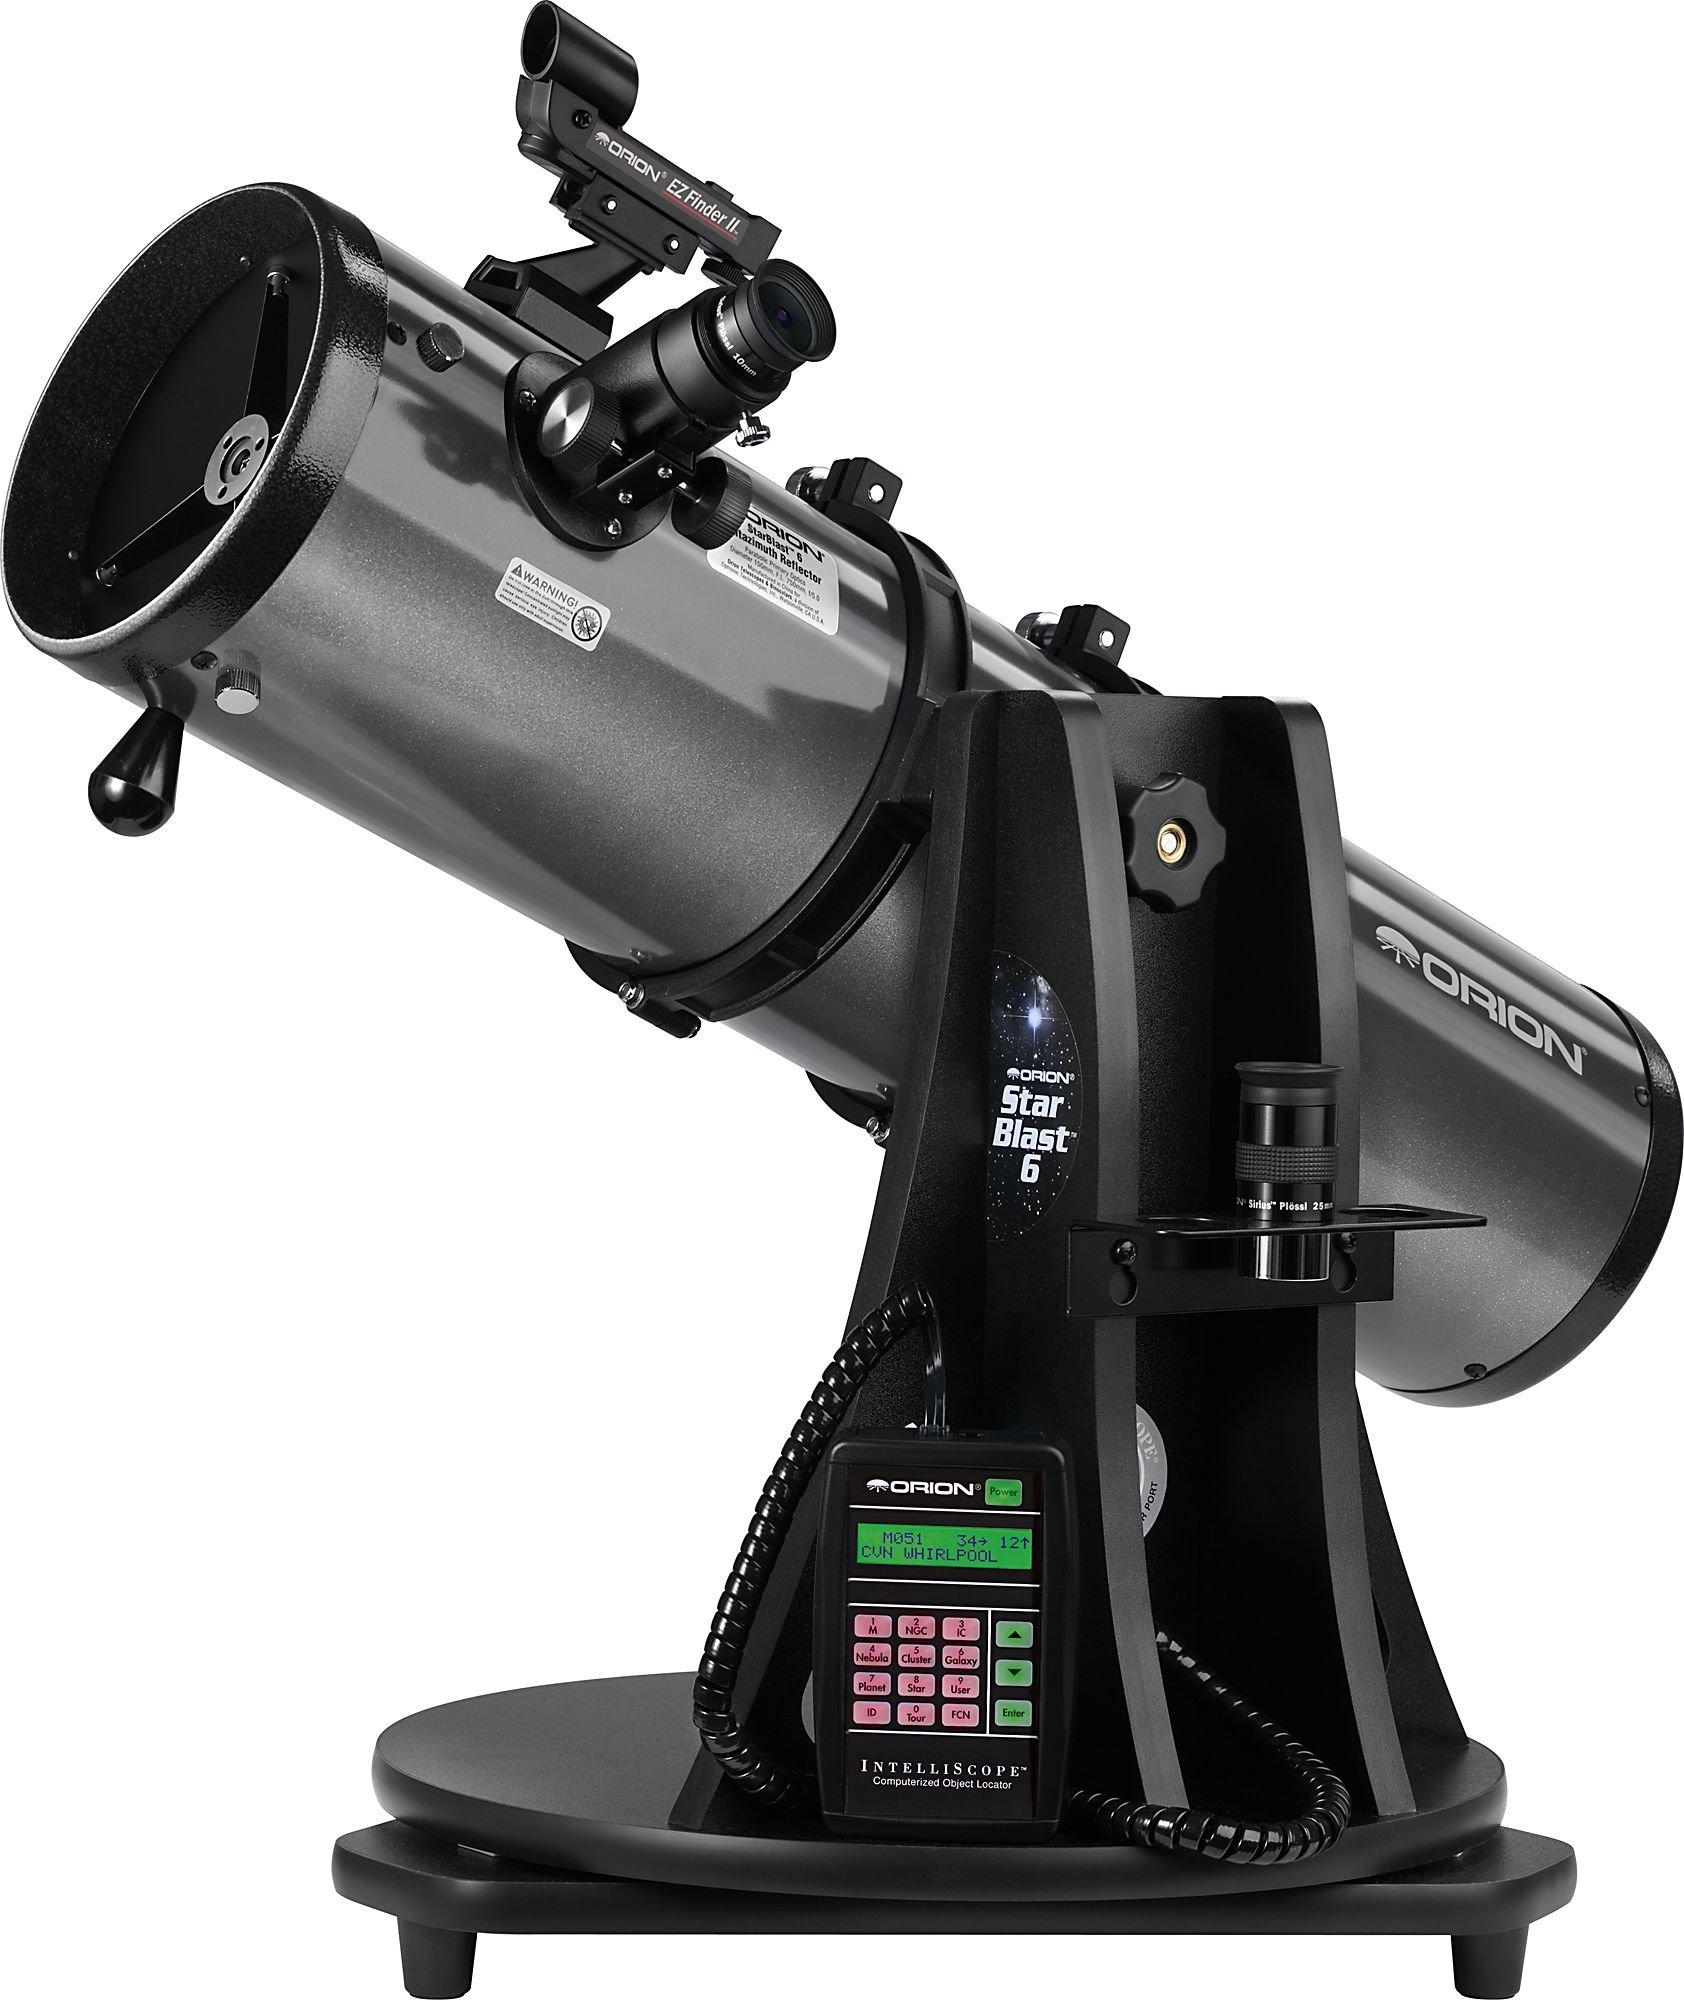 Orion 27191 StarBlast 6i IntelliScope Reflector Telescope by Orion